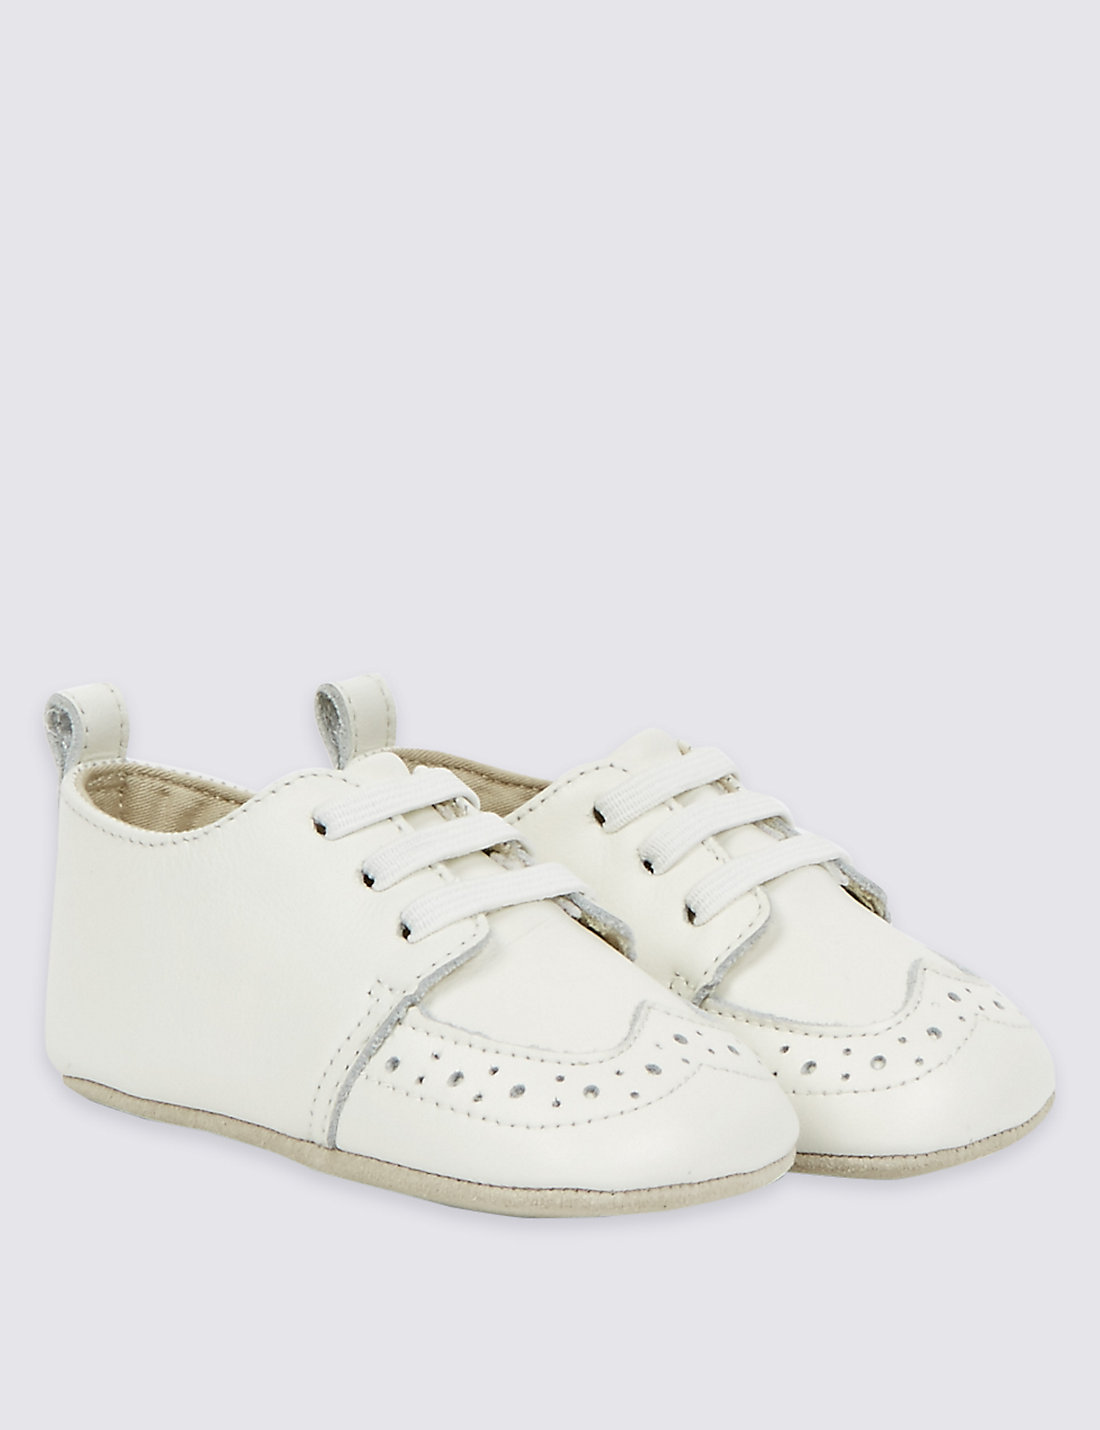 Slip On Pram Shoes at M&S